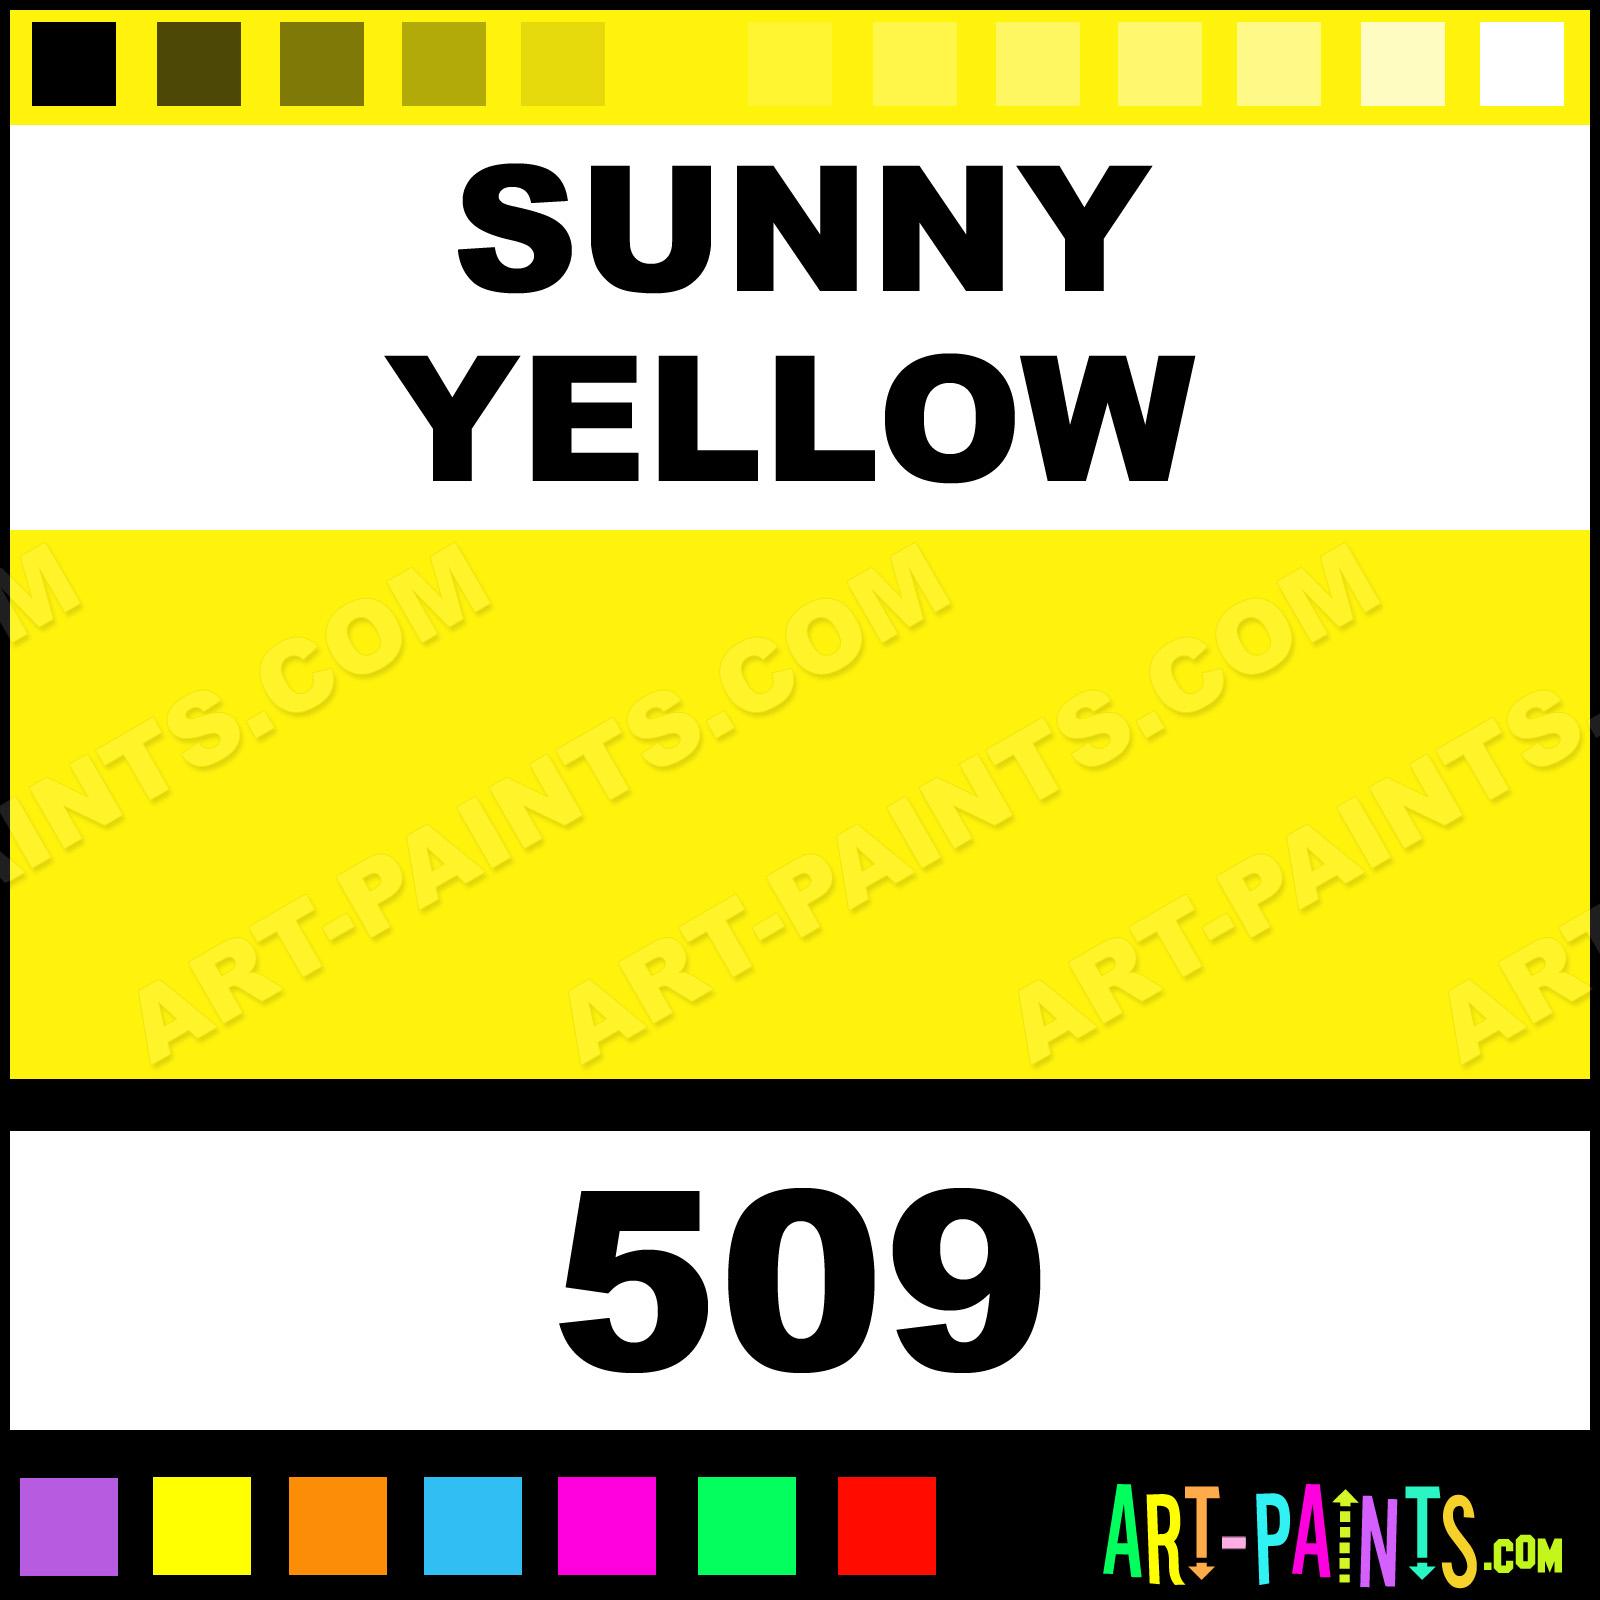 Folk art color chart acrylic paint - Sunny Yellow Sunny Yellow Paint